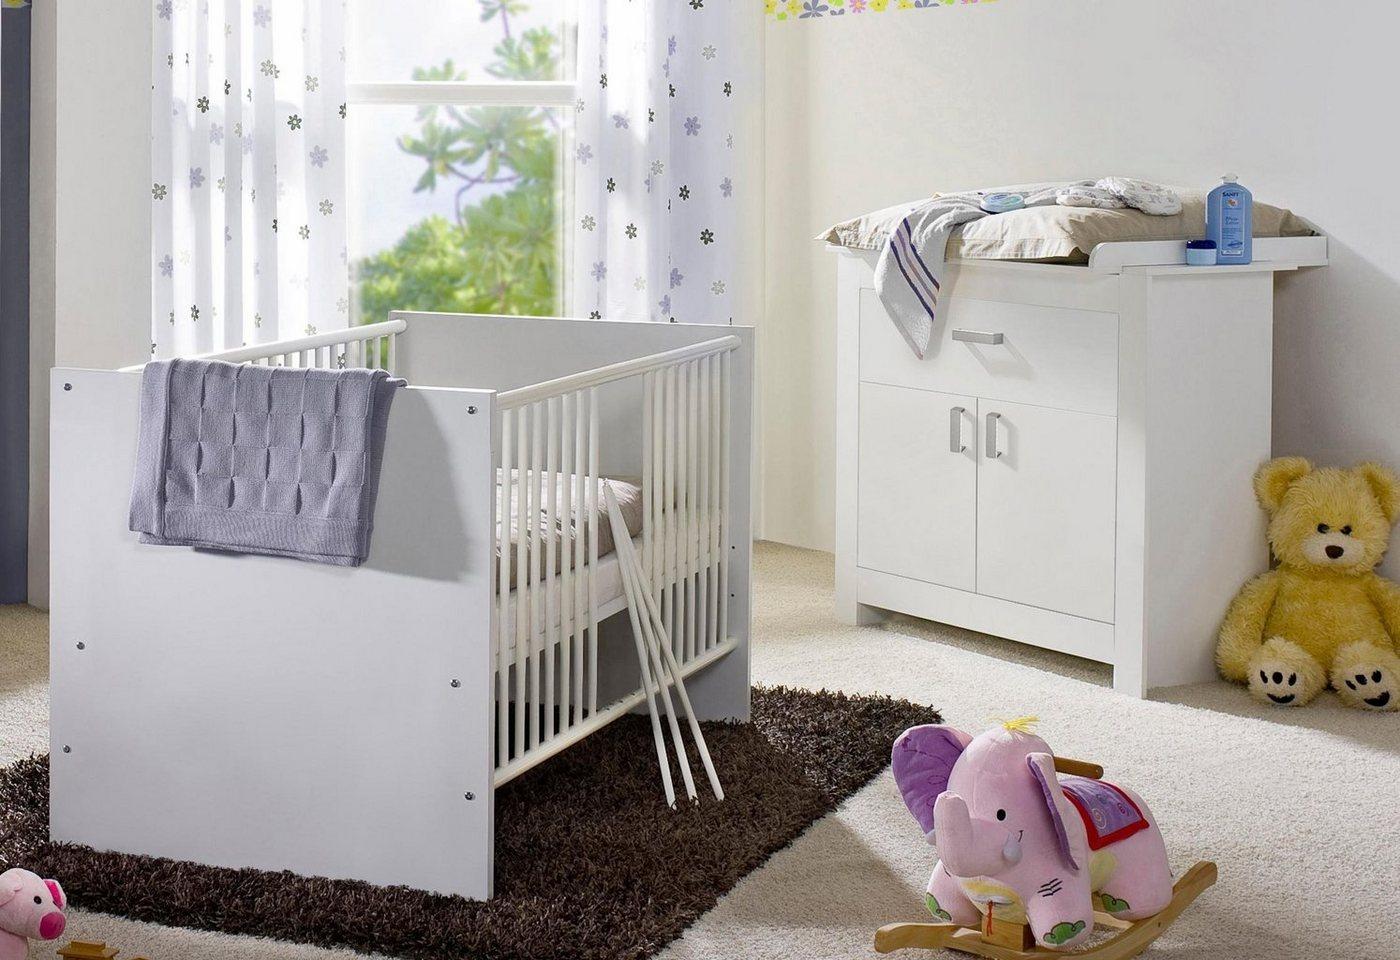 babybett wickelkommode preisvergleiche. Black Bedroom Furniture Sets. Home Design Ideas